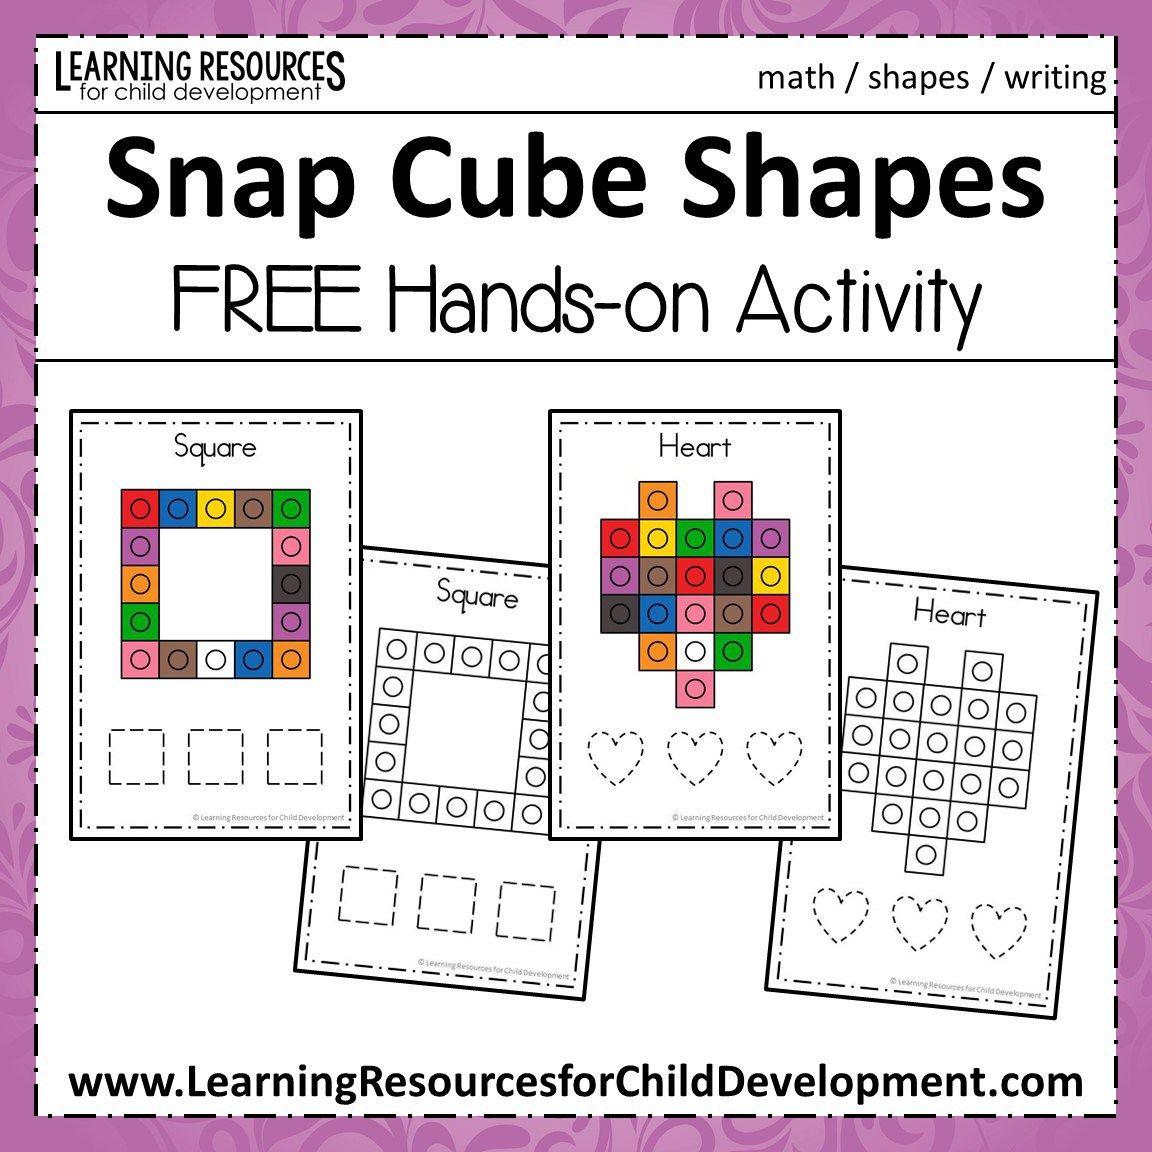 Snap Cube Shapes